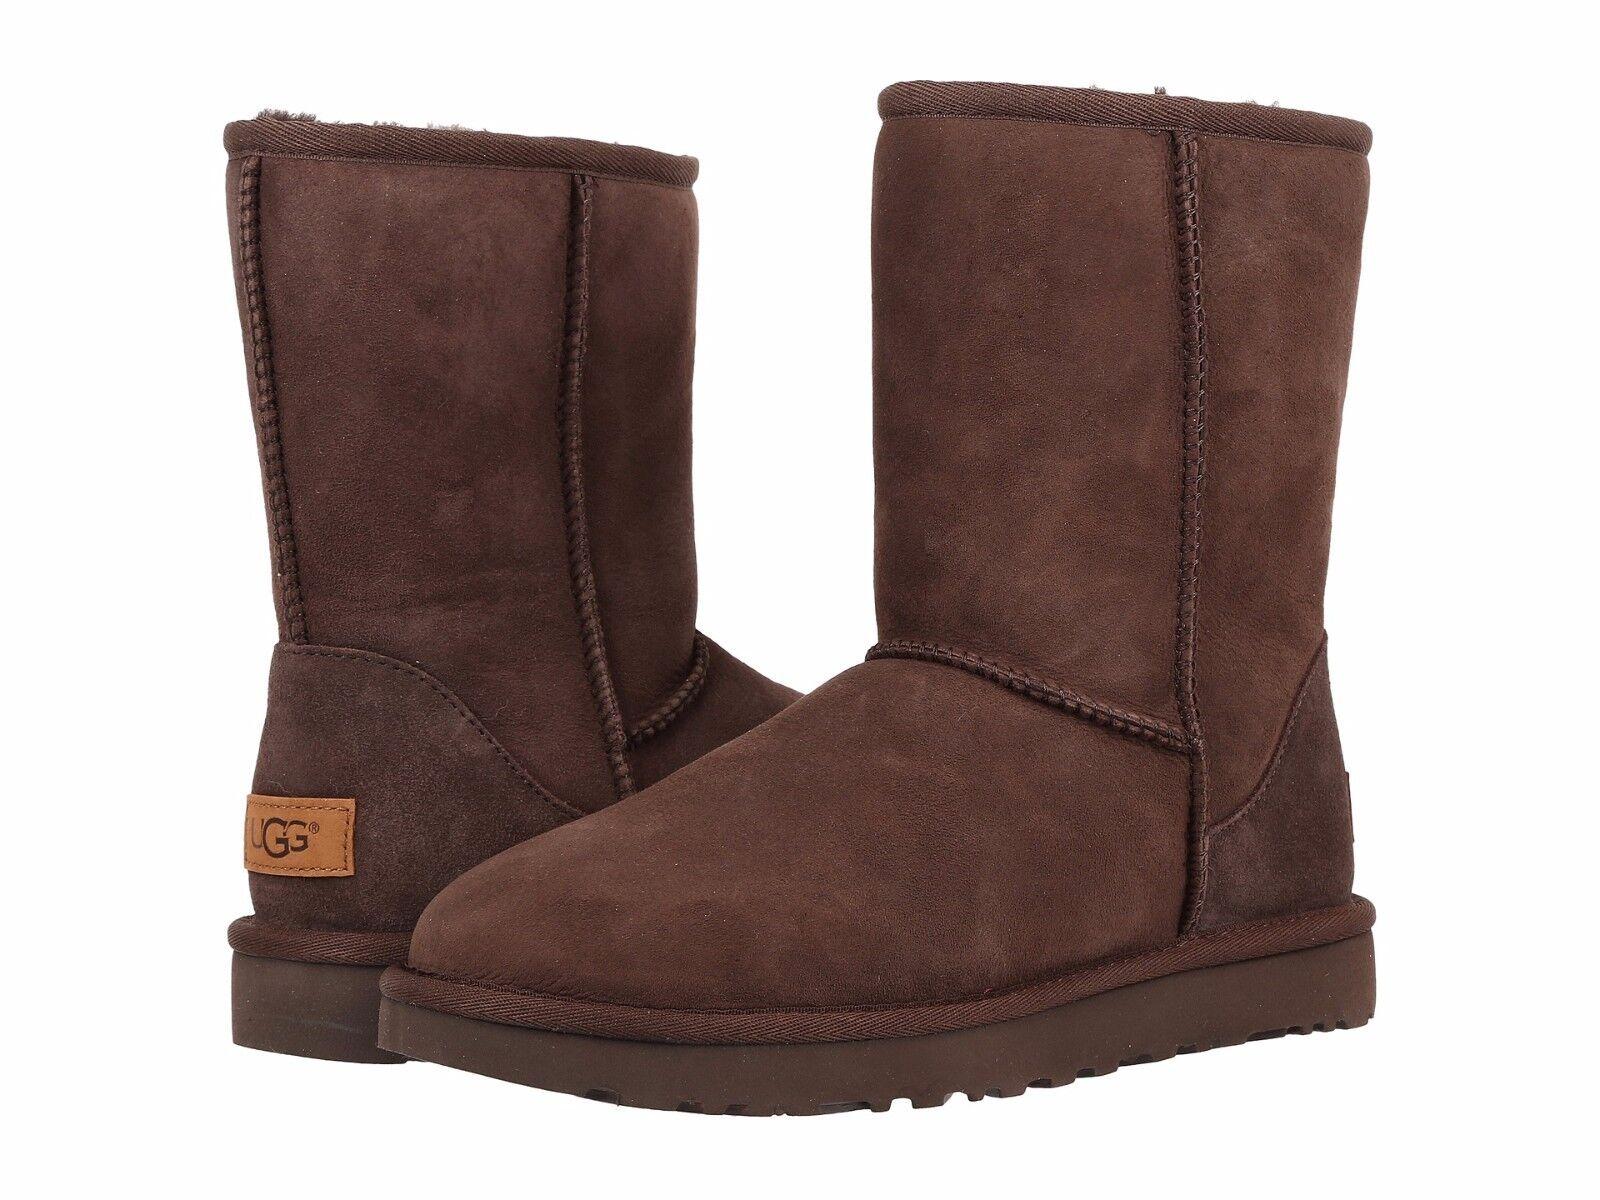 Chaussures pour femmes UGG Classic Short II Boots 1016223 Chocolate 5 6 7 8 9 10 11 * Nouveau *